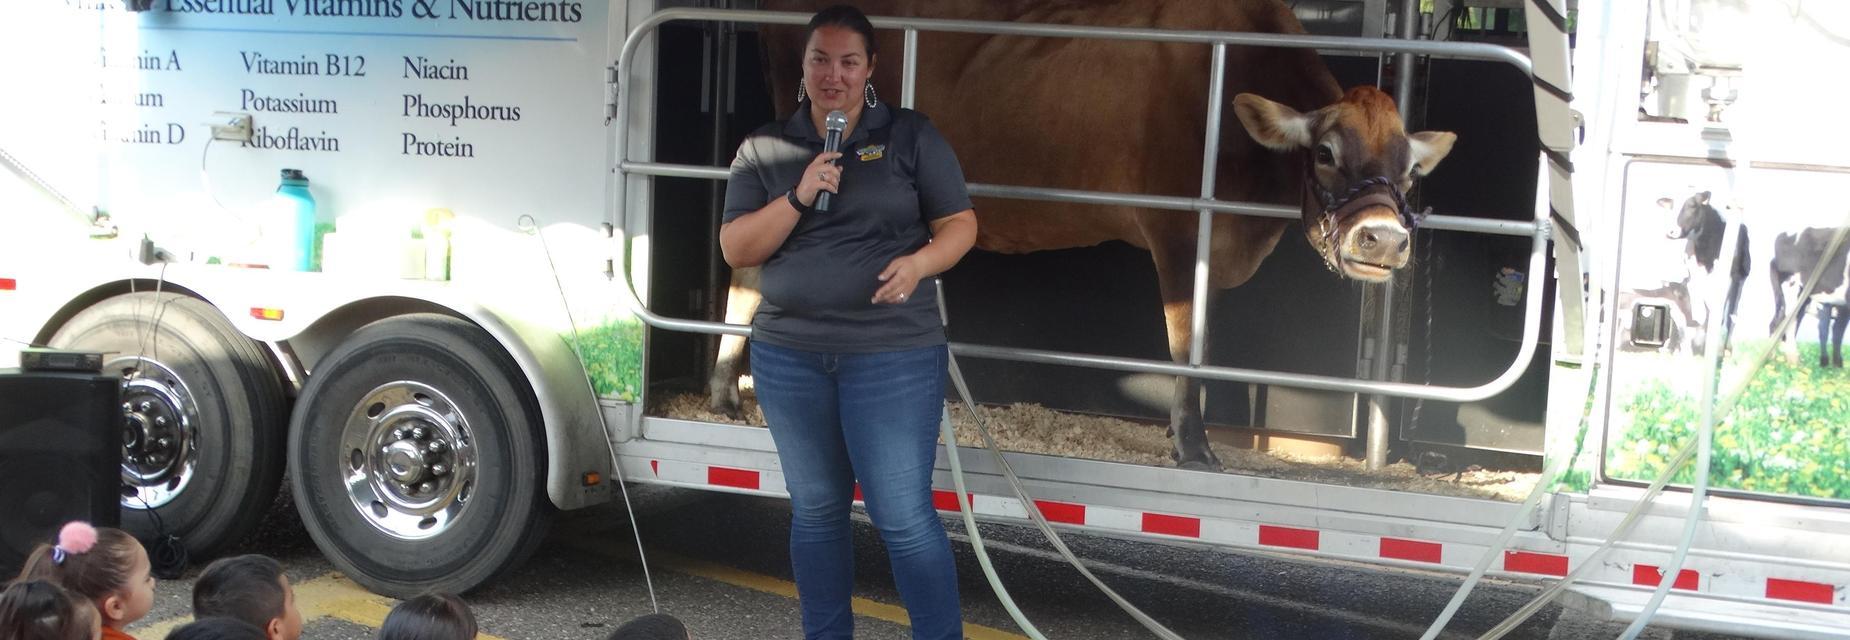 Presenter for the dairy farm